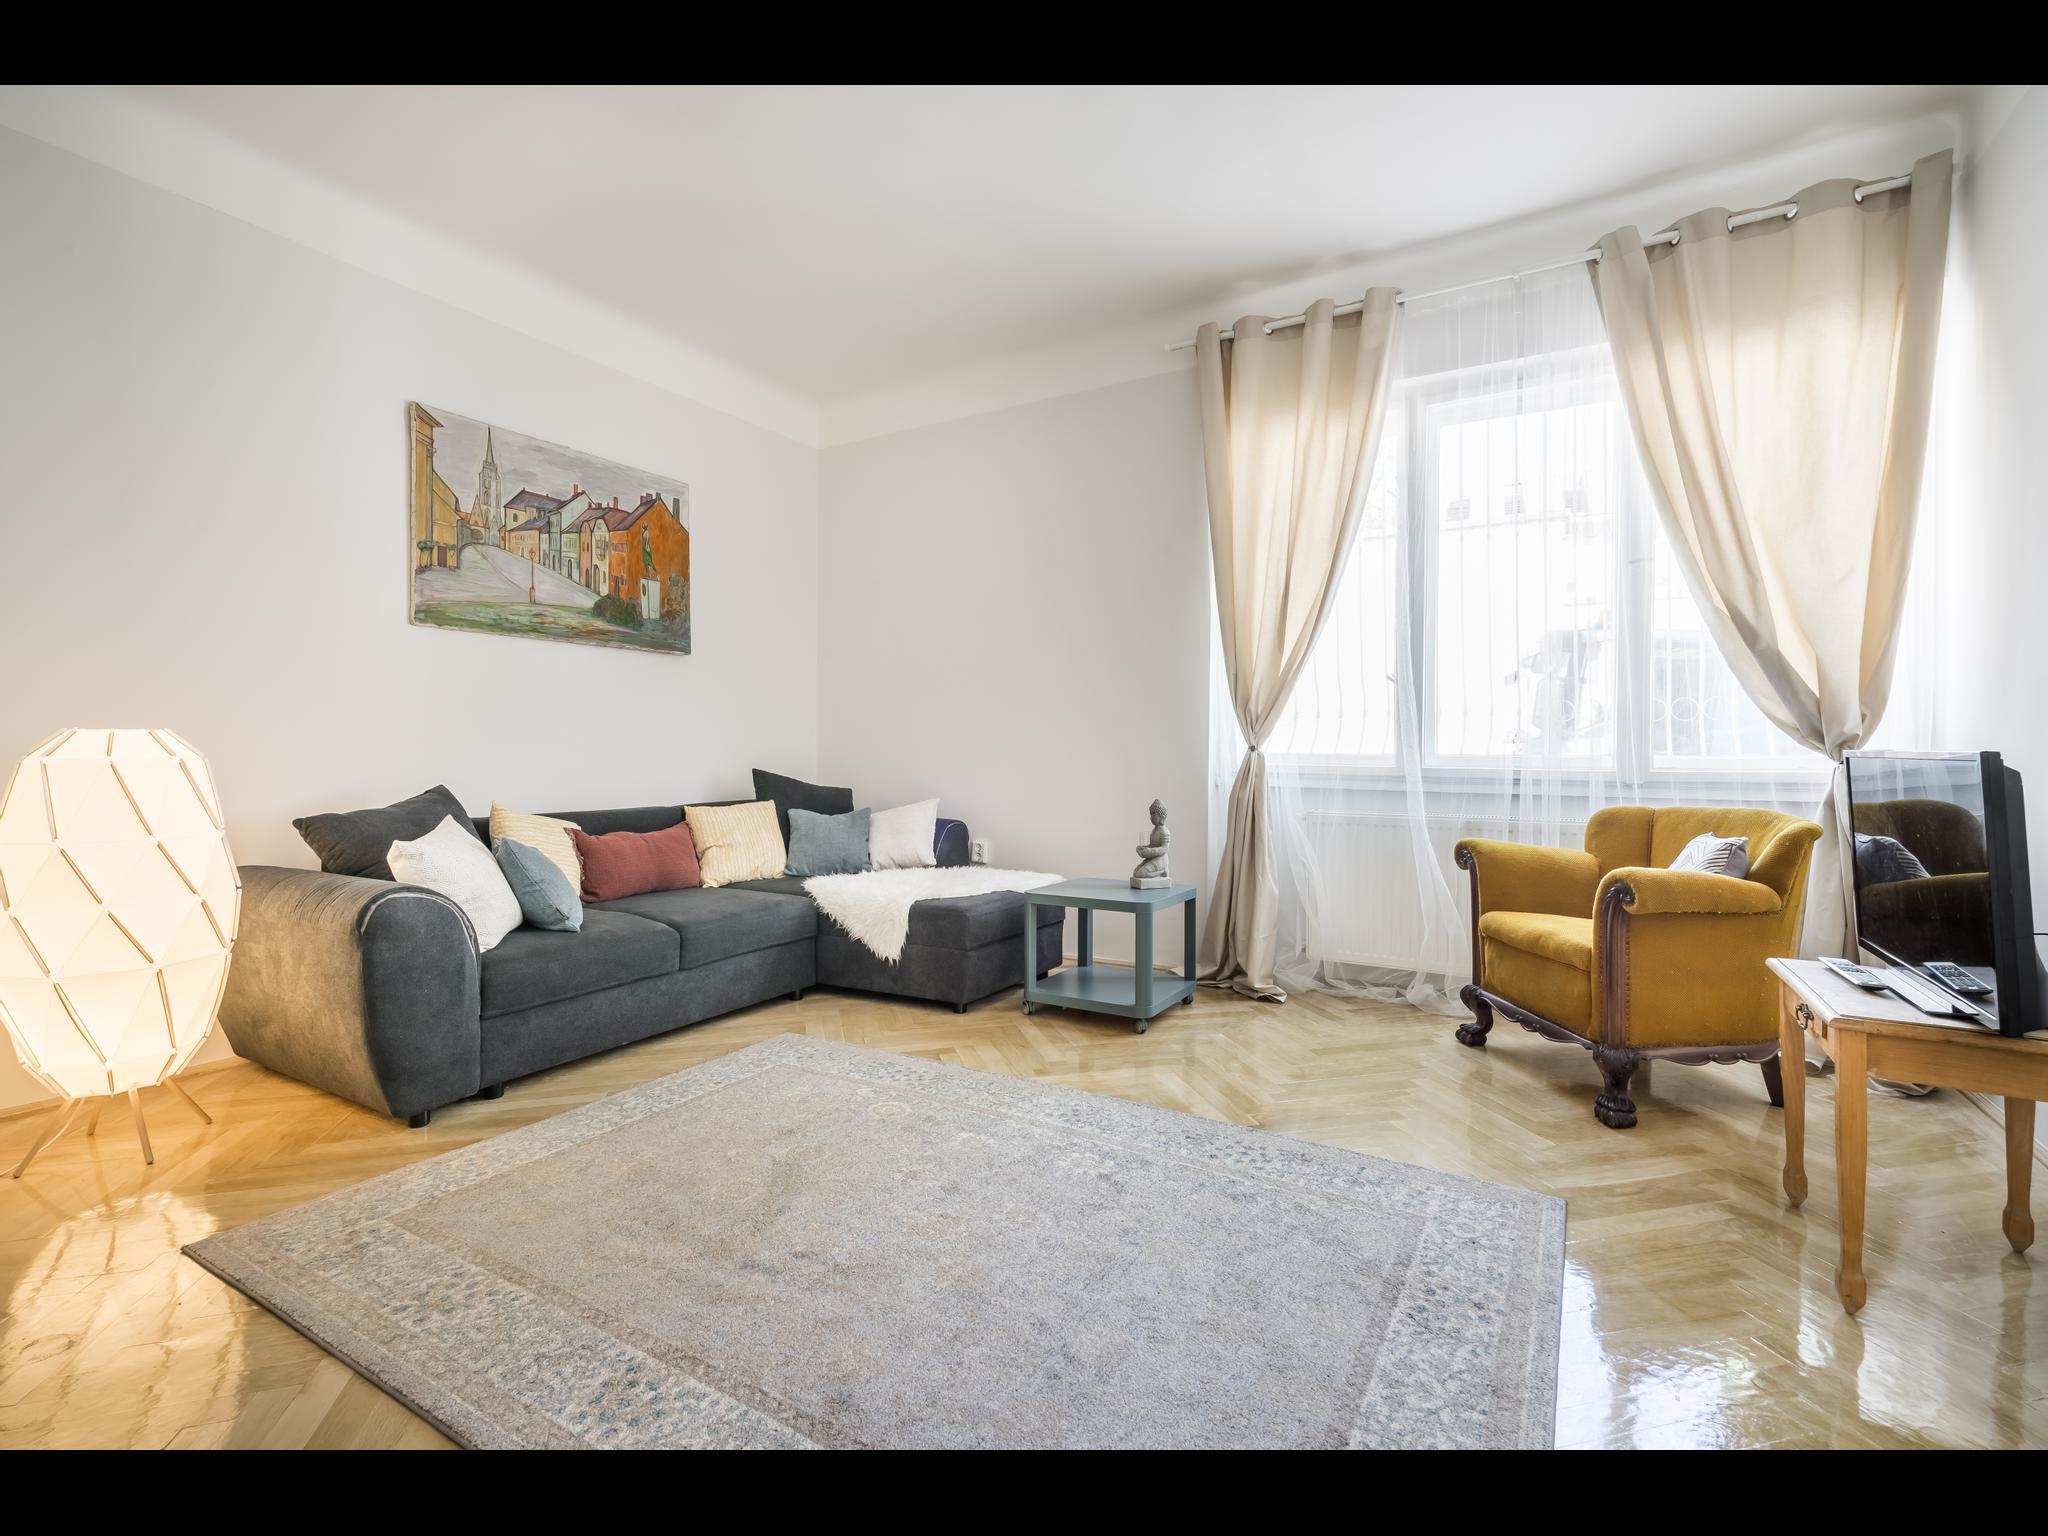 Ponty - 3 Bedroom flat in Budapest